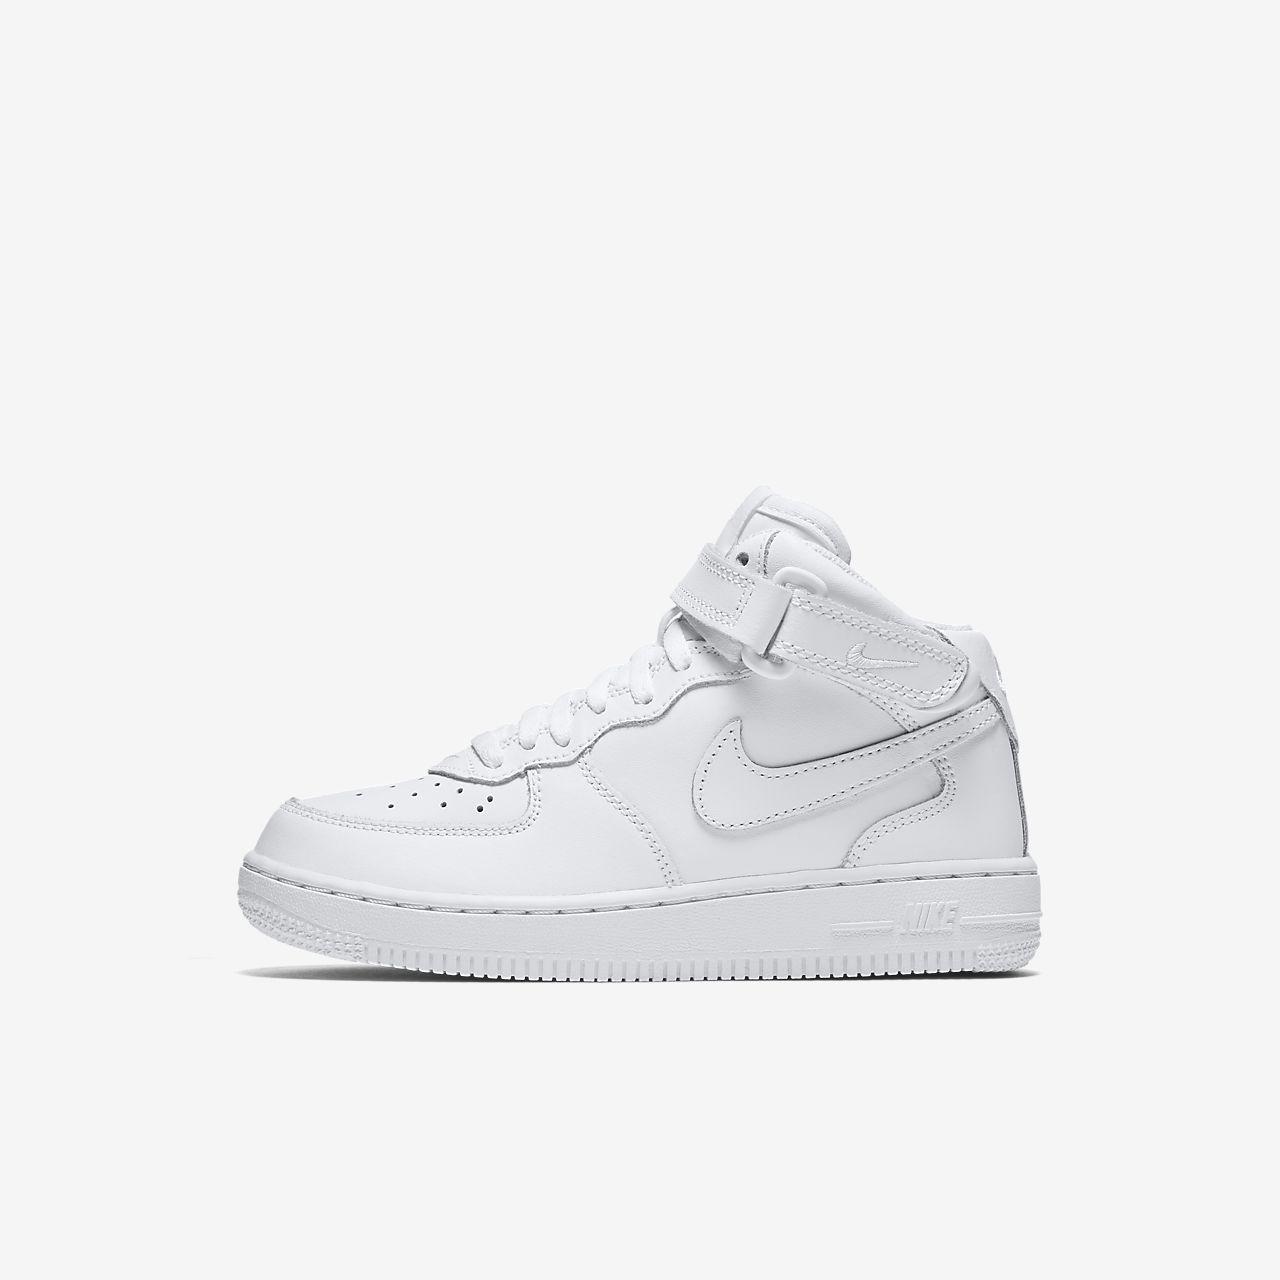 chaussure air force 1 femme jeune